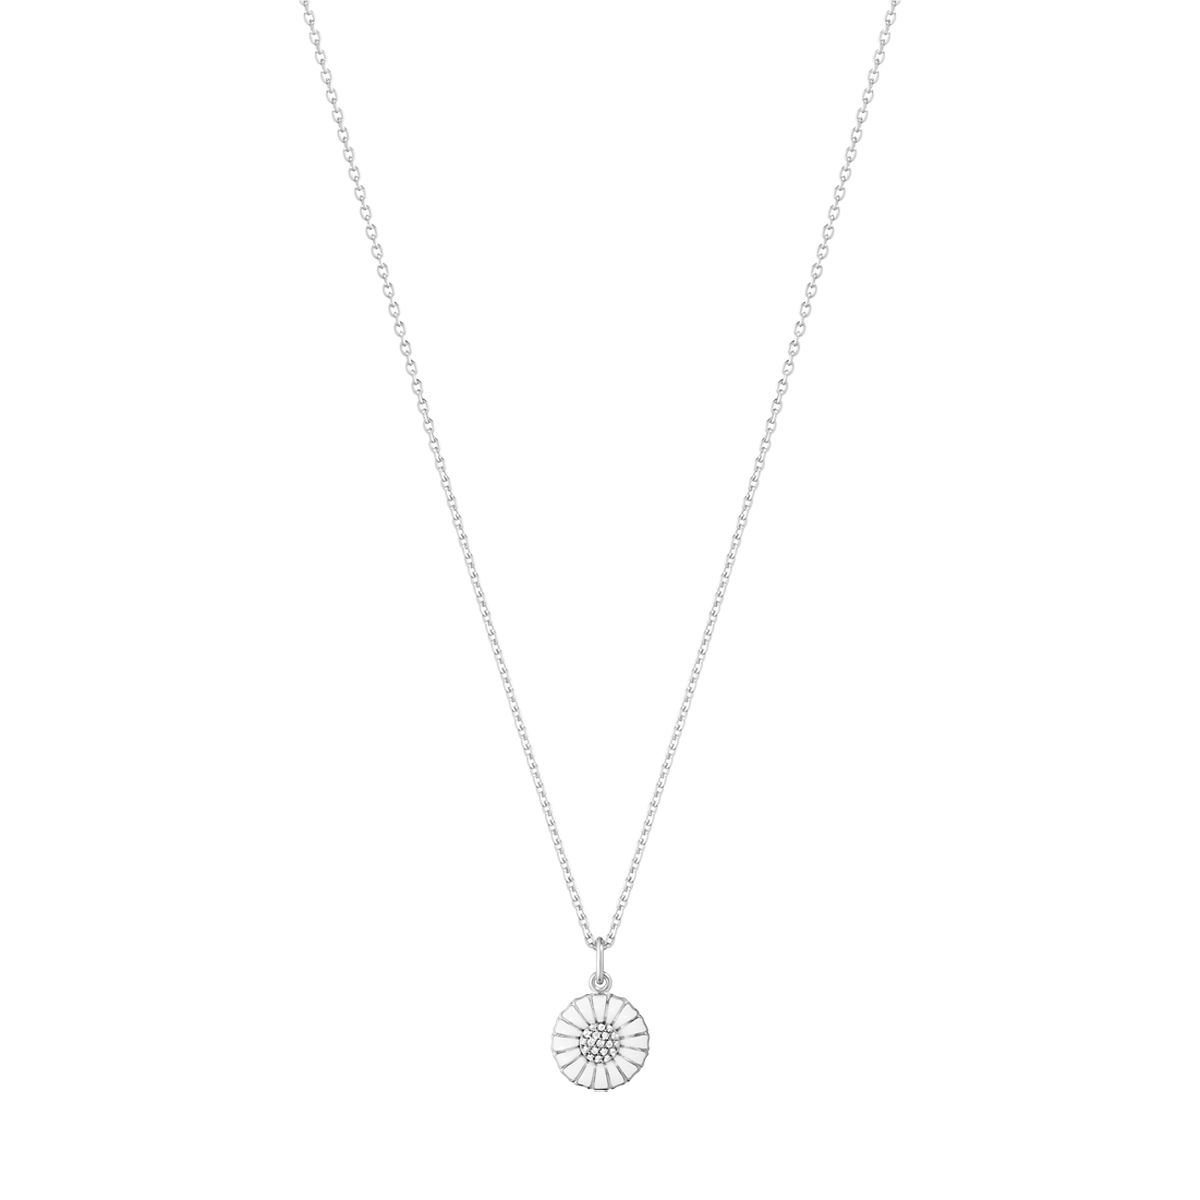 Georg Jensen Daisy halskæde m/diamanter 10010534